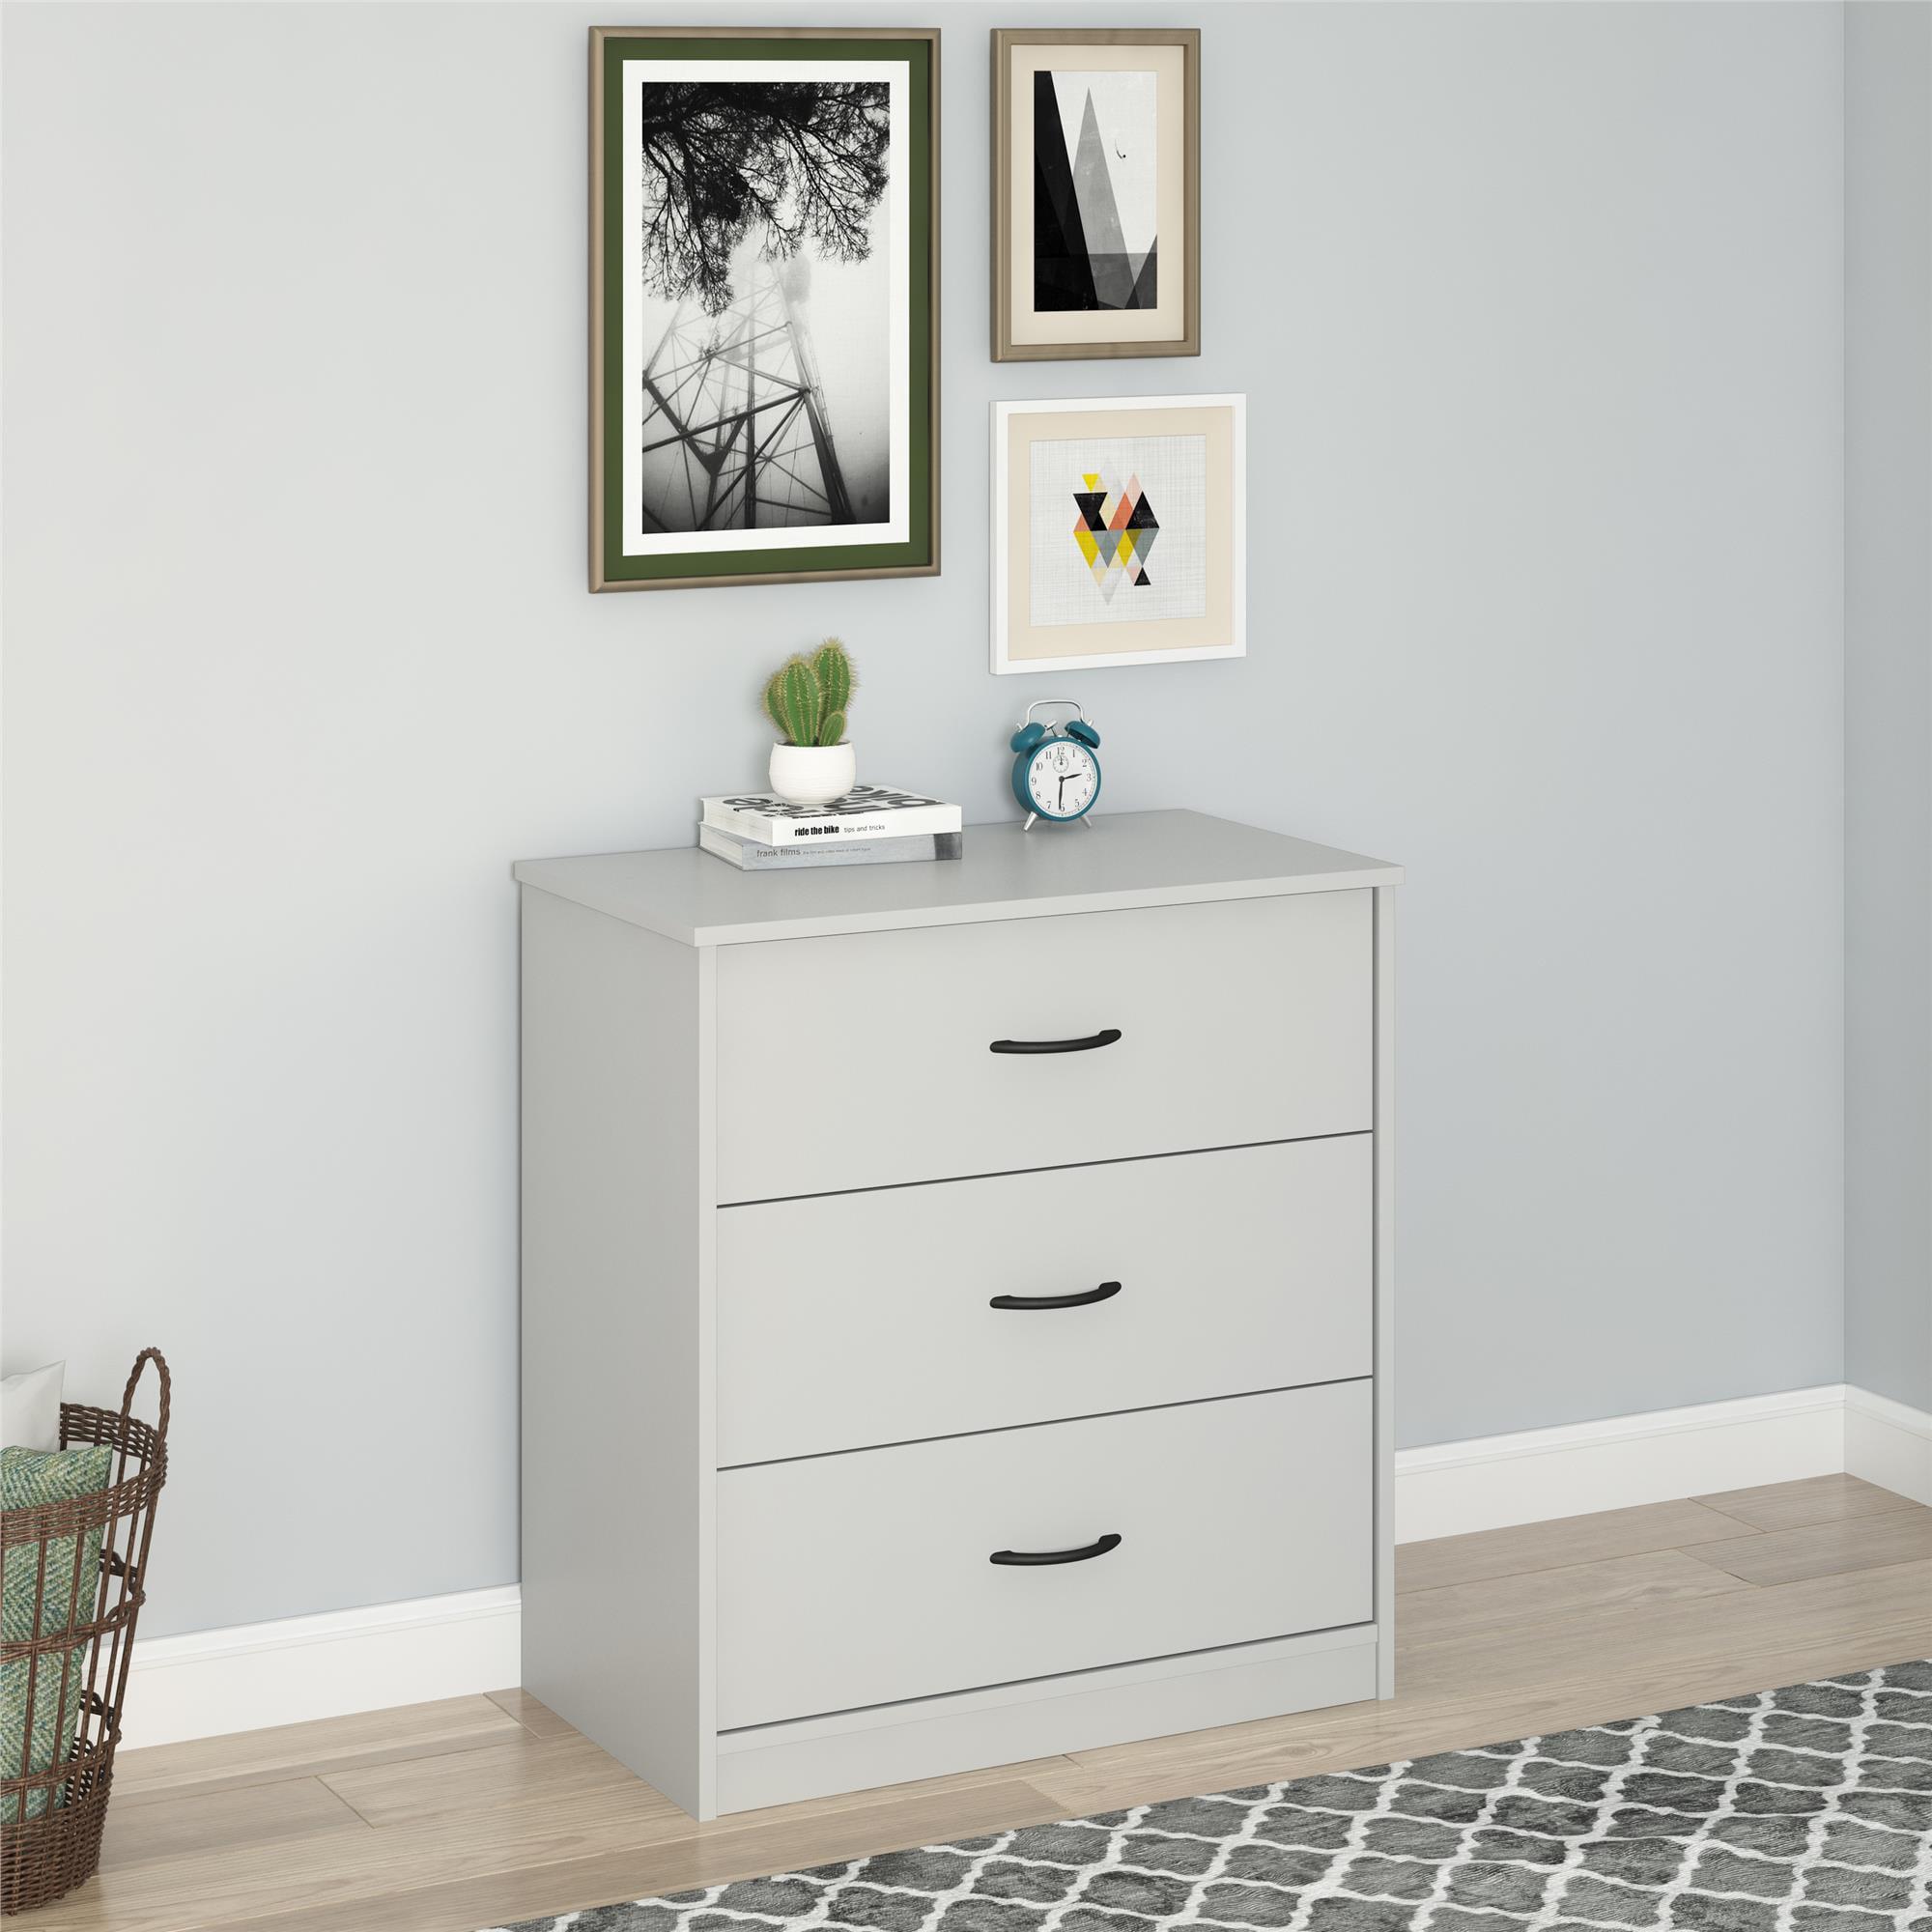 3df6c240f66f Mainstays 3 Drawer Dresser, Multiple Finishes - Walmart.com